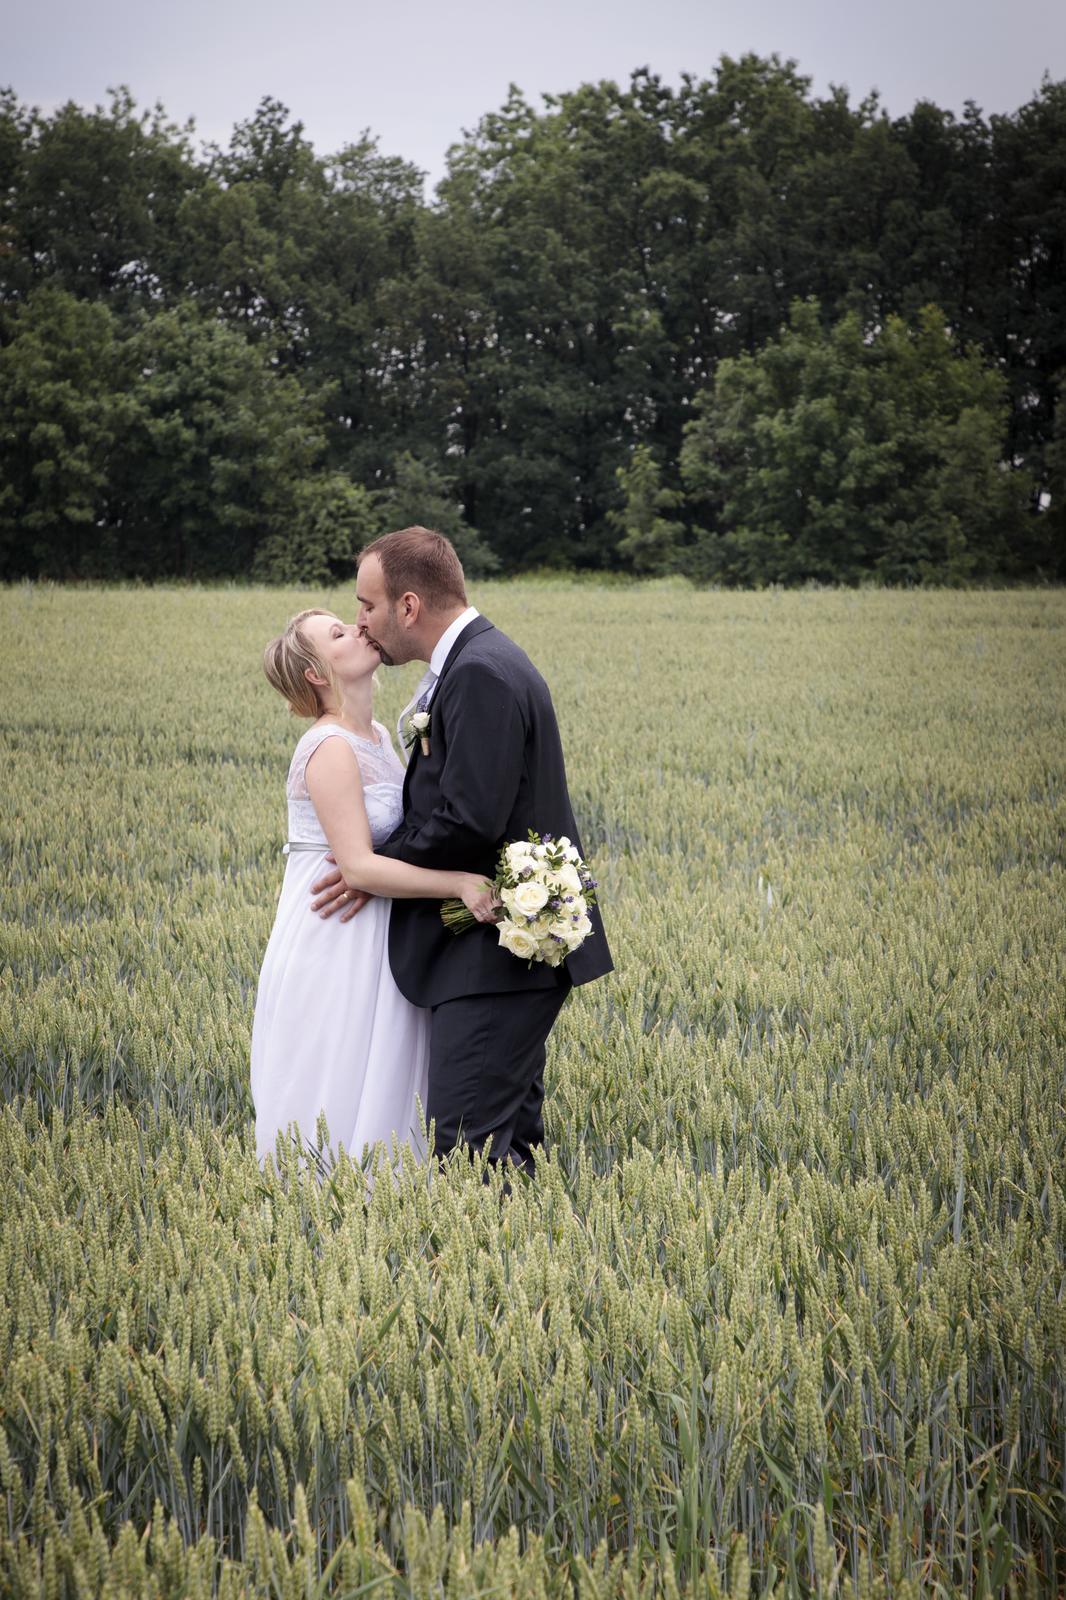 1.6.2018 svatba Jinočany - Obrázek č. 16